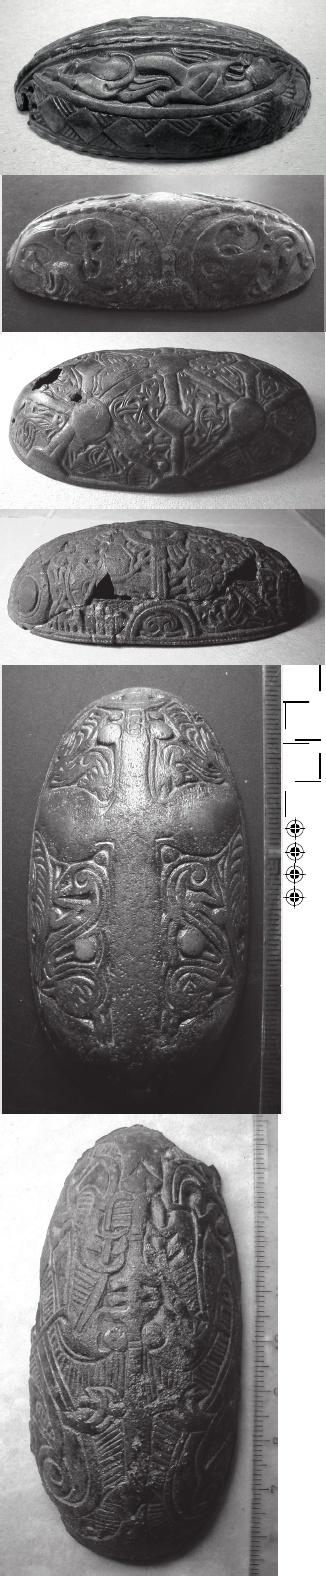 ype  variant  Domed oblong brooches of Vendel Period Scandinavia | Martin Rundkvist - Academia.edu